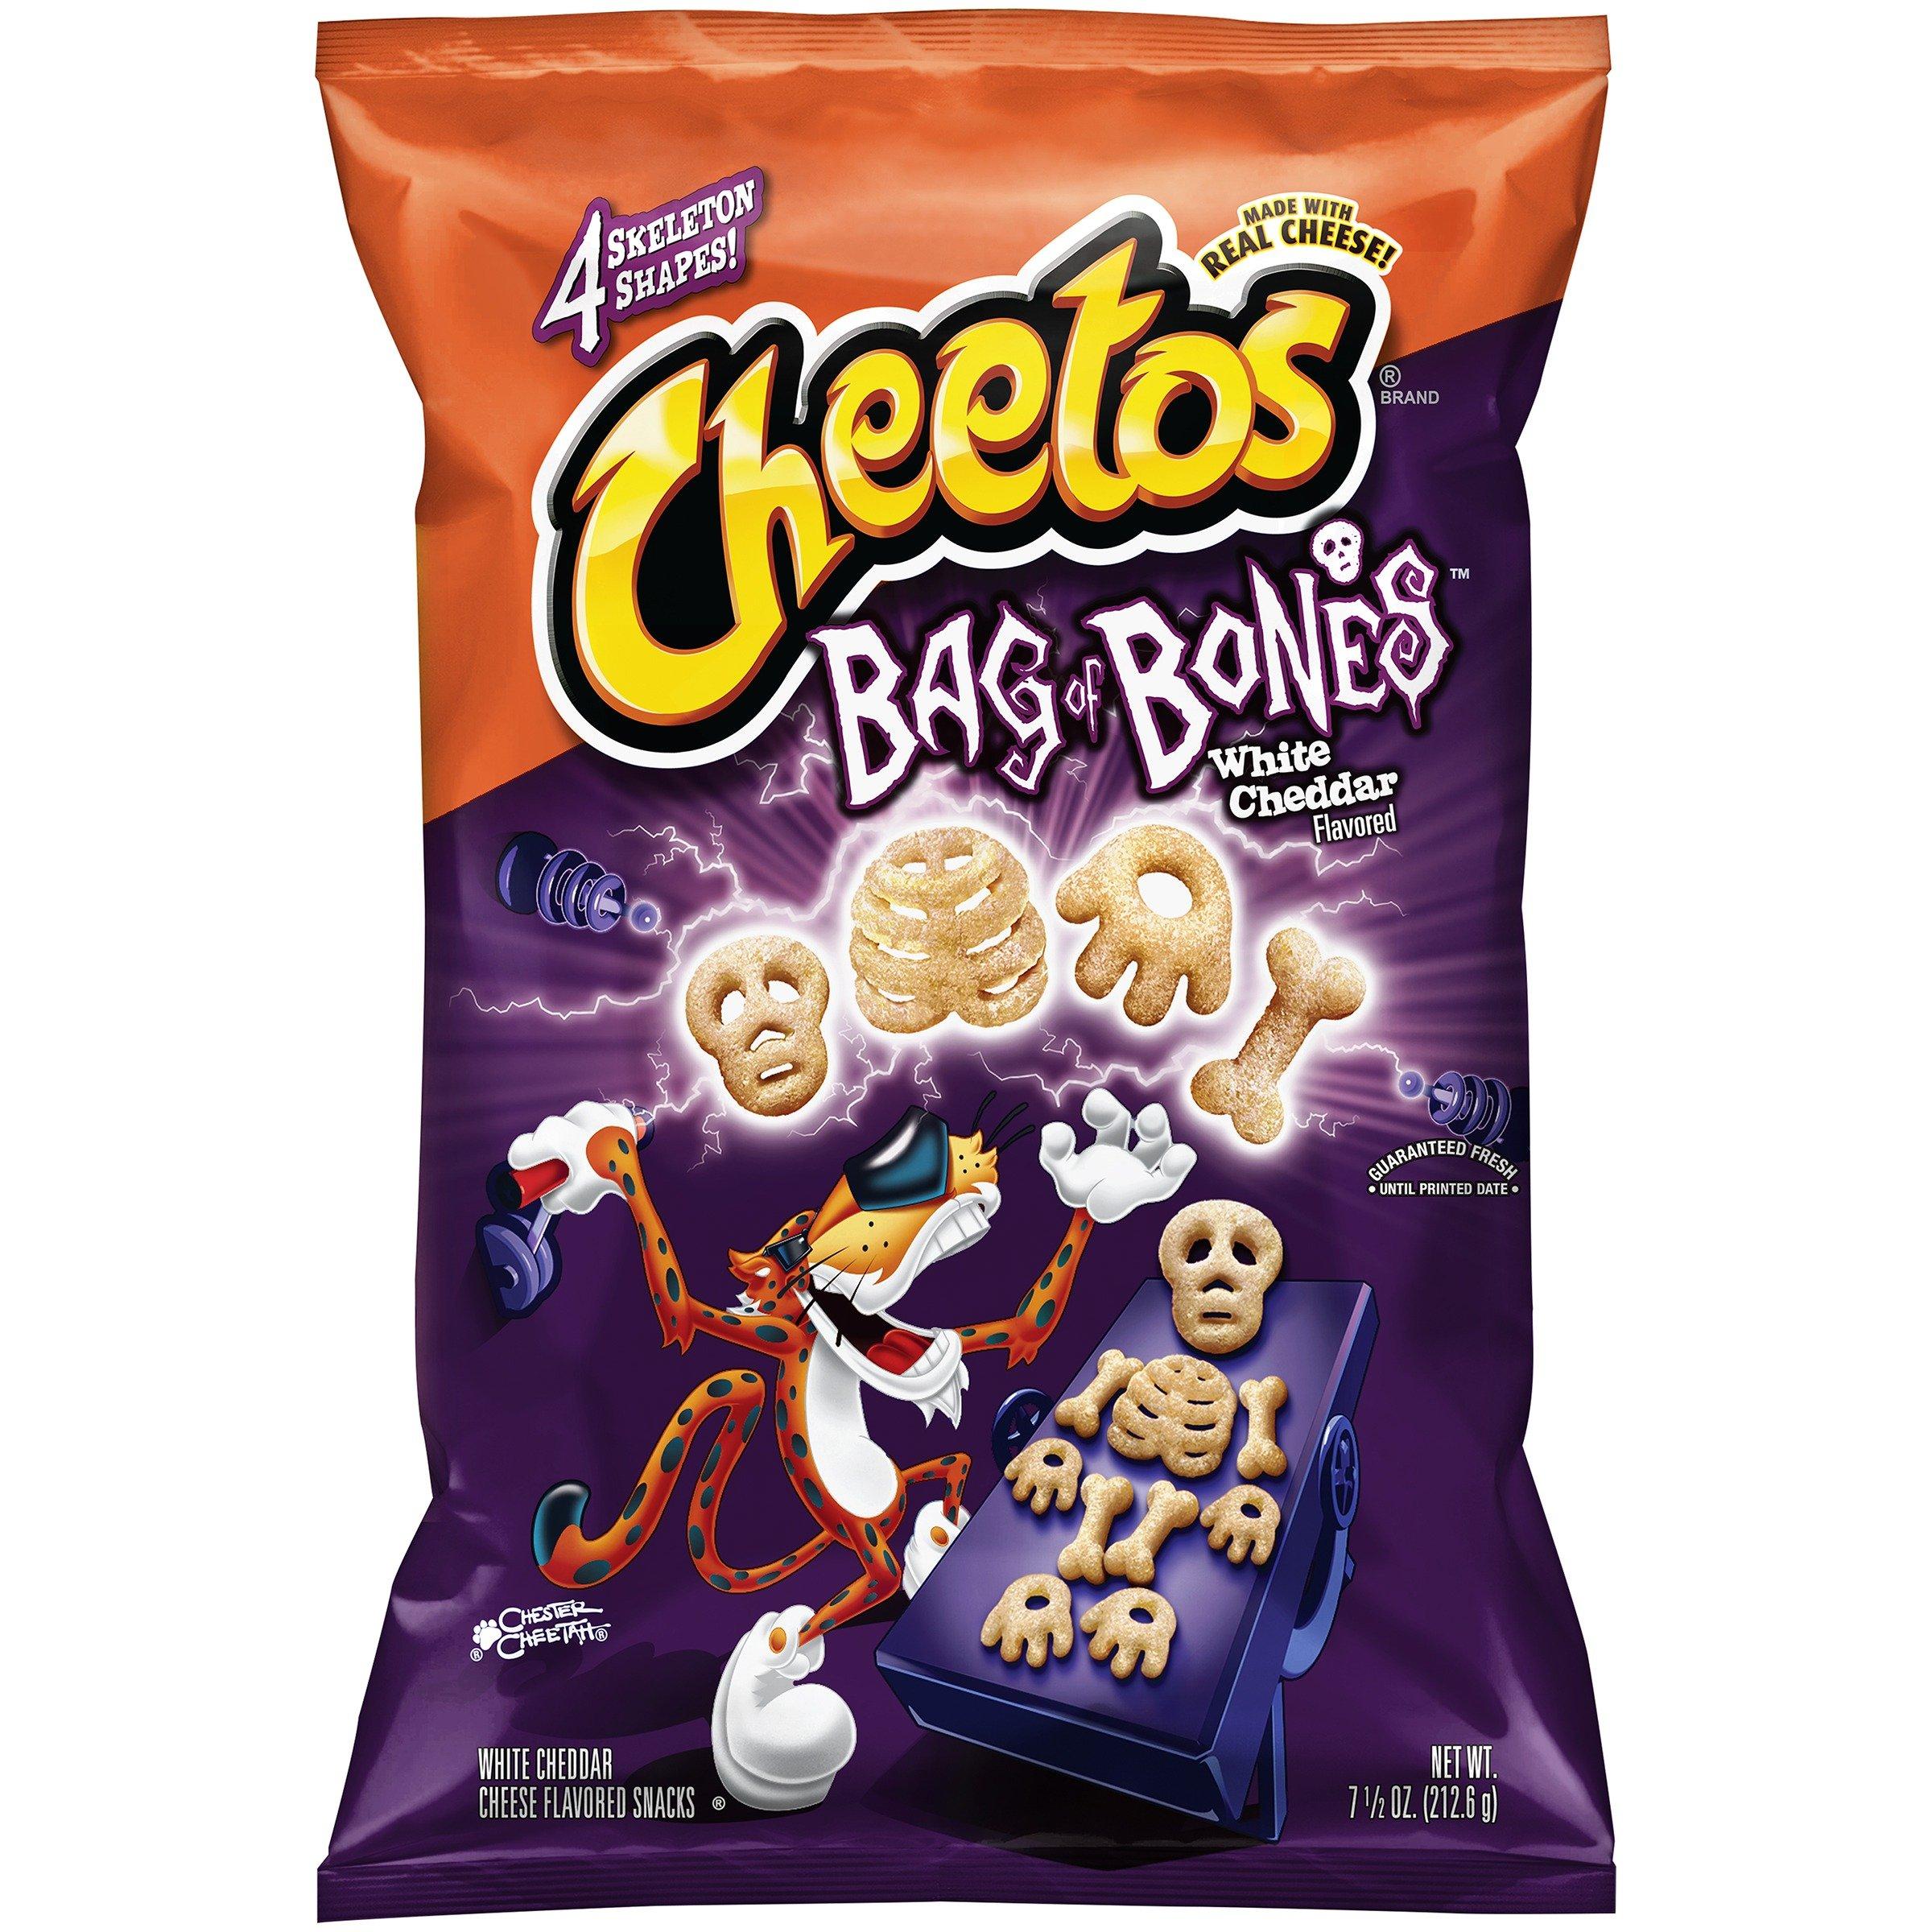 CHEETOS BAG OF BONES WHITE CHEDDAR CHEESE FLAVORED 7.5 oz. BAG ( 2 BAGS )